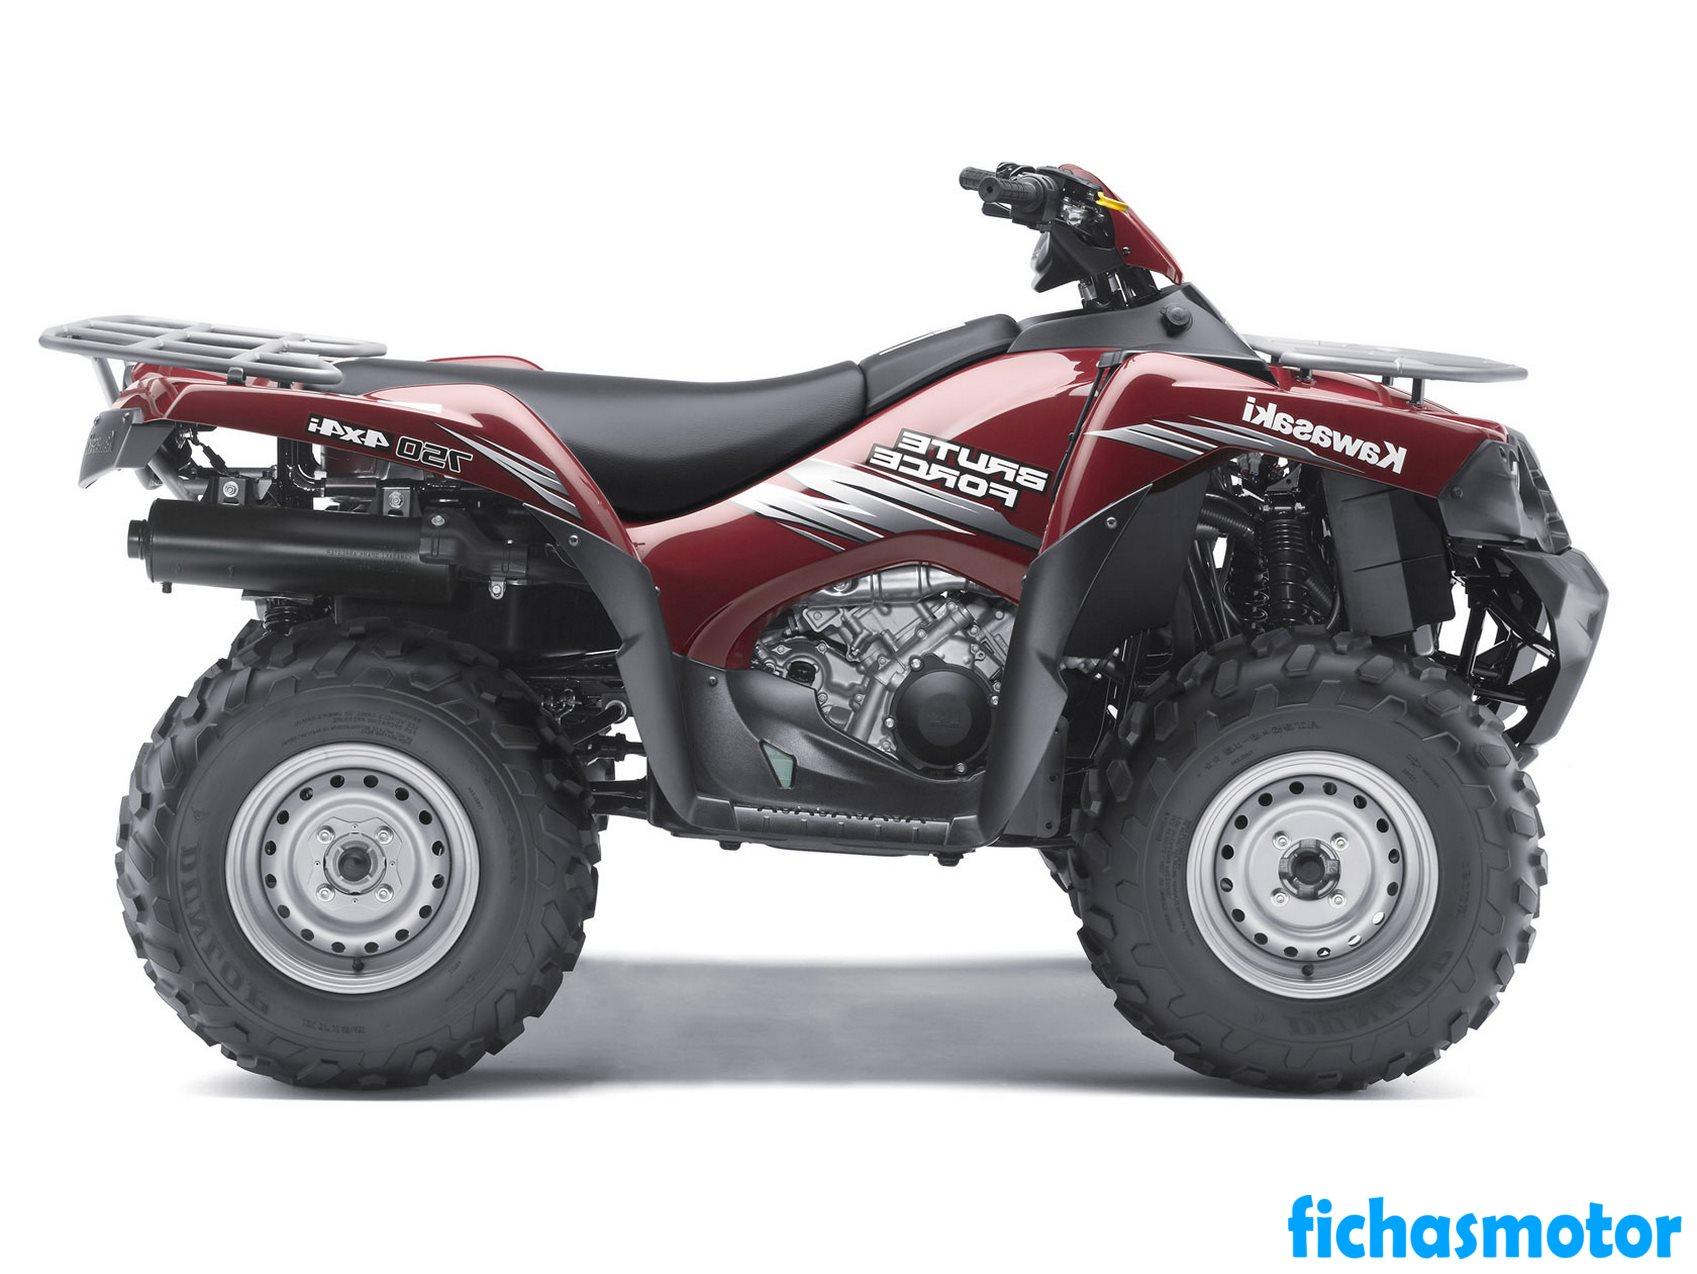 Ficha técnica Kawasaki brute force 750 4x4i 2011